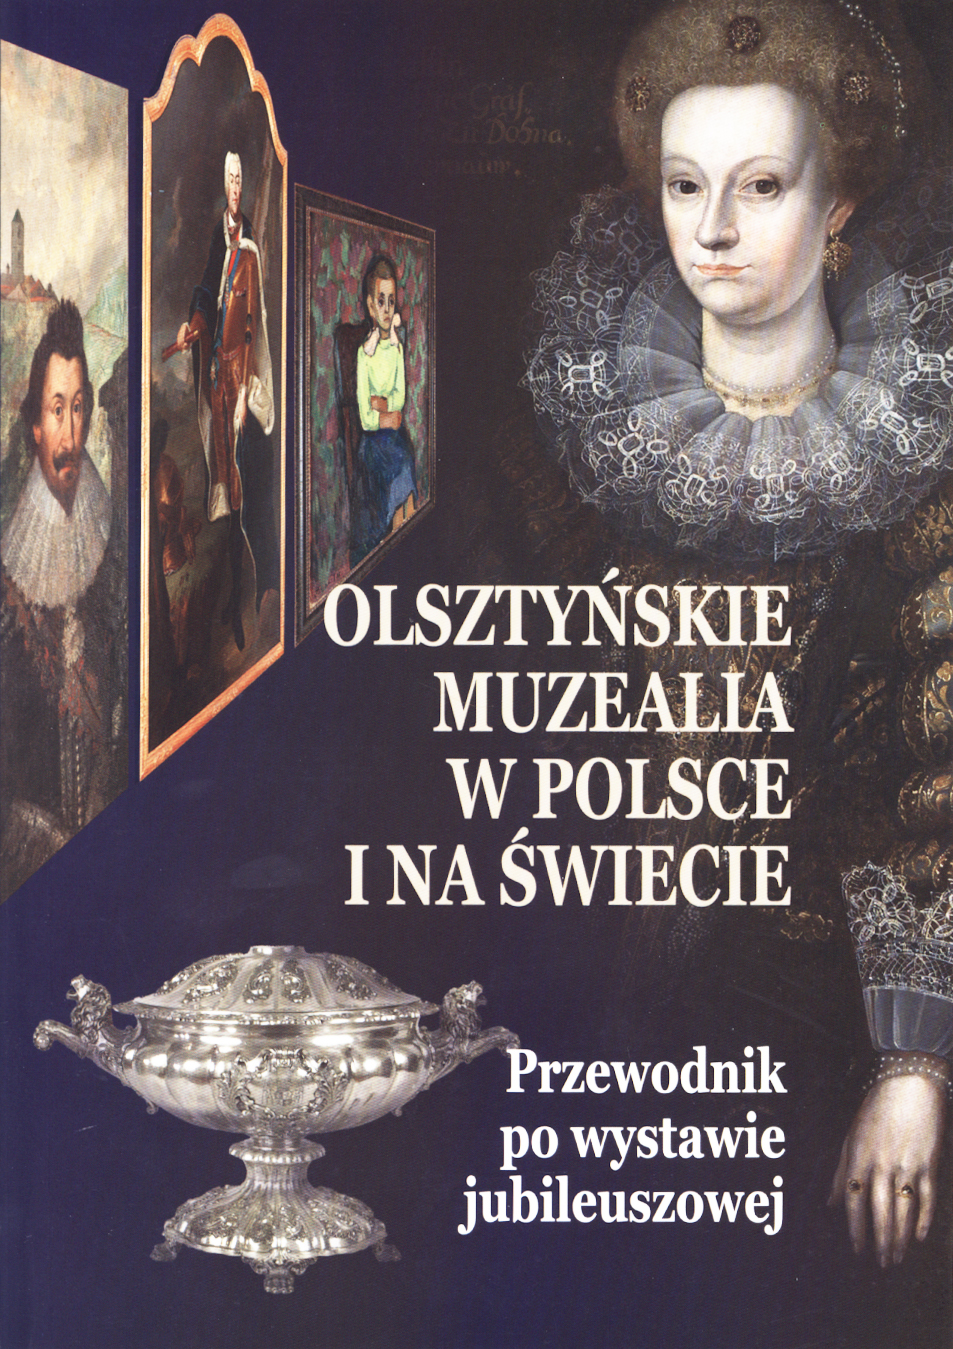 http://m.wmwm.pl/2016/02/orig/olsztynskie-muzealia-5023.jpg